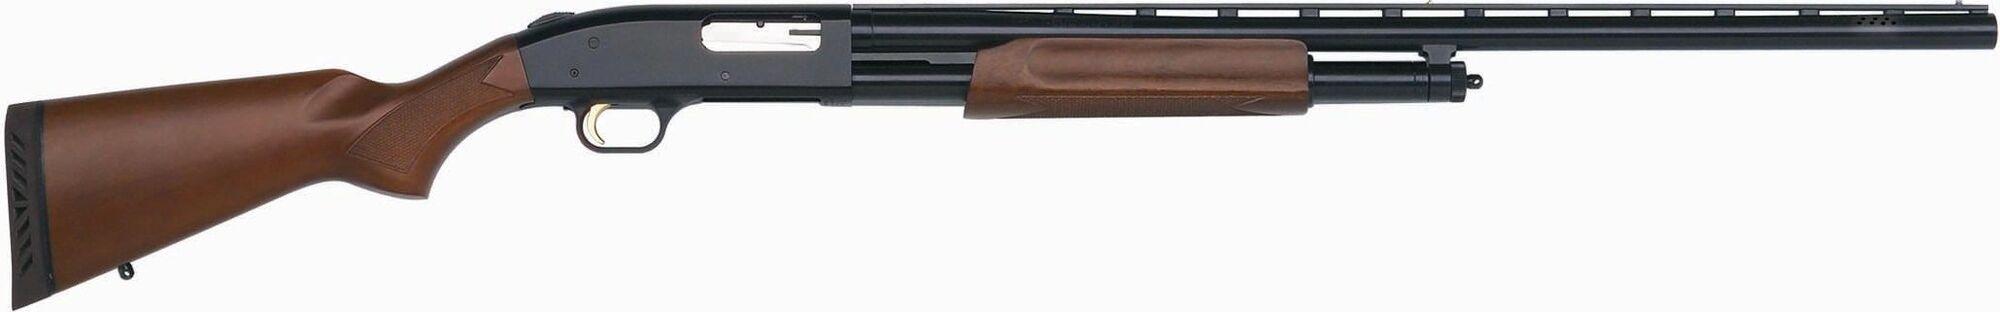 Mossberg 500 | Gun Wiki | FANDOM powered by Wikia